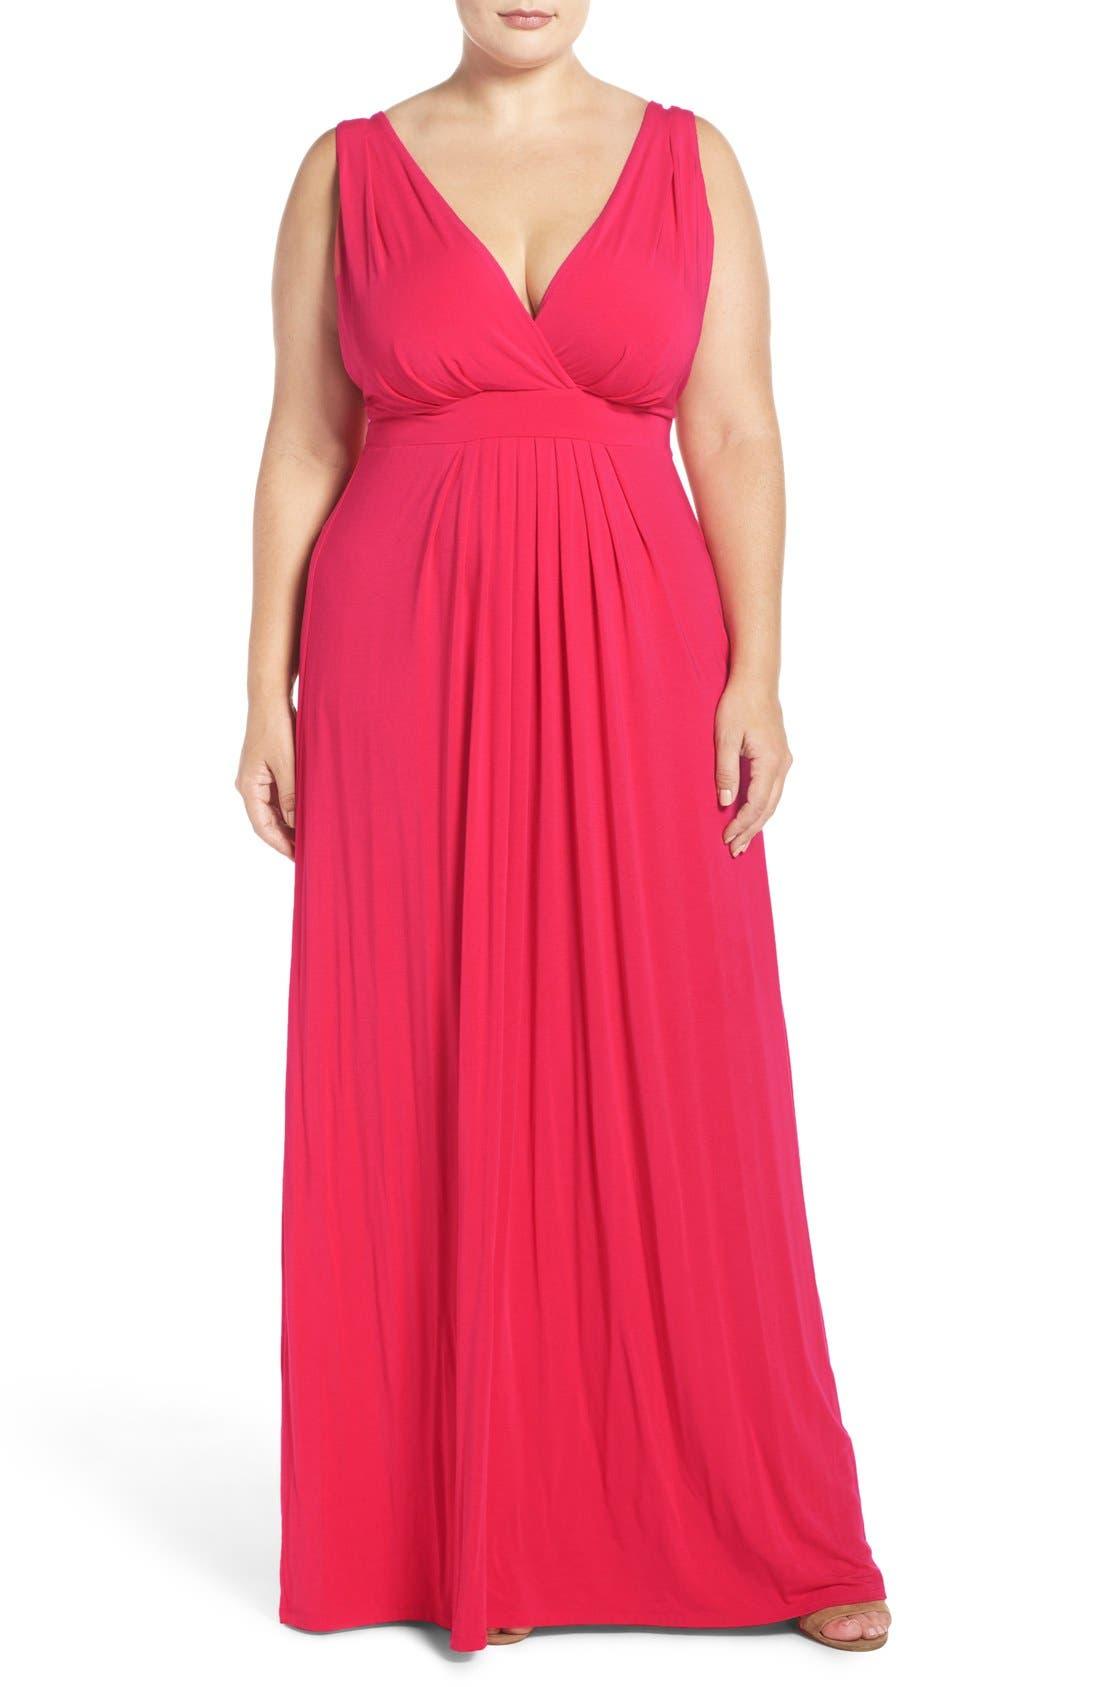 Chloe Empire Waist Maxi Dress,                         Main,                         color, Rose Red